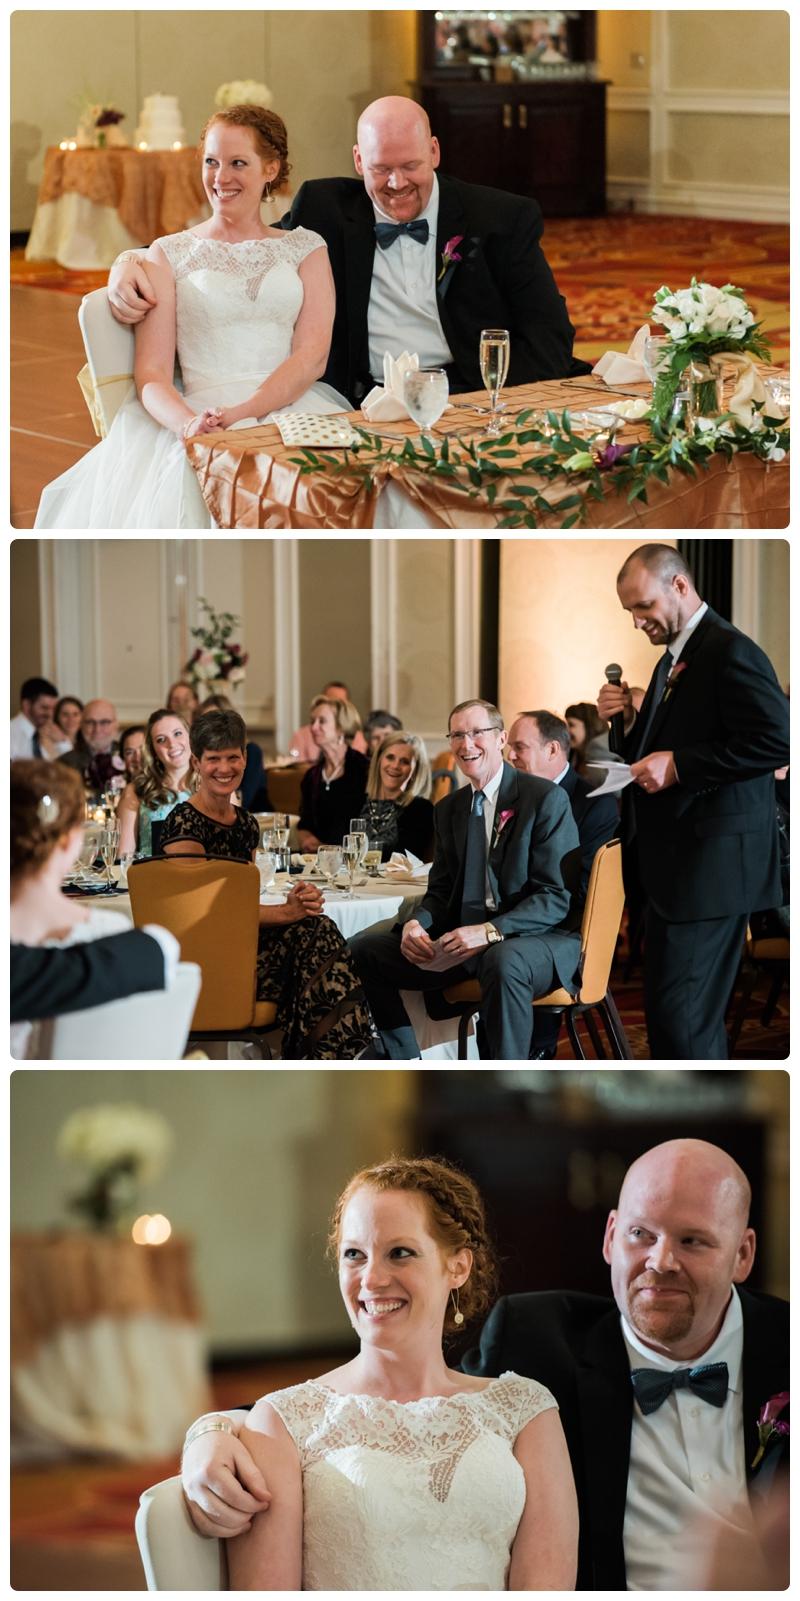 Wedding in Falls Church Virginia by Rachael Foster Photography_0040.jpg